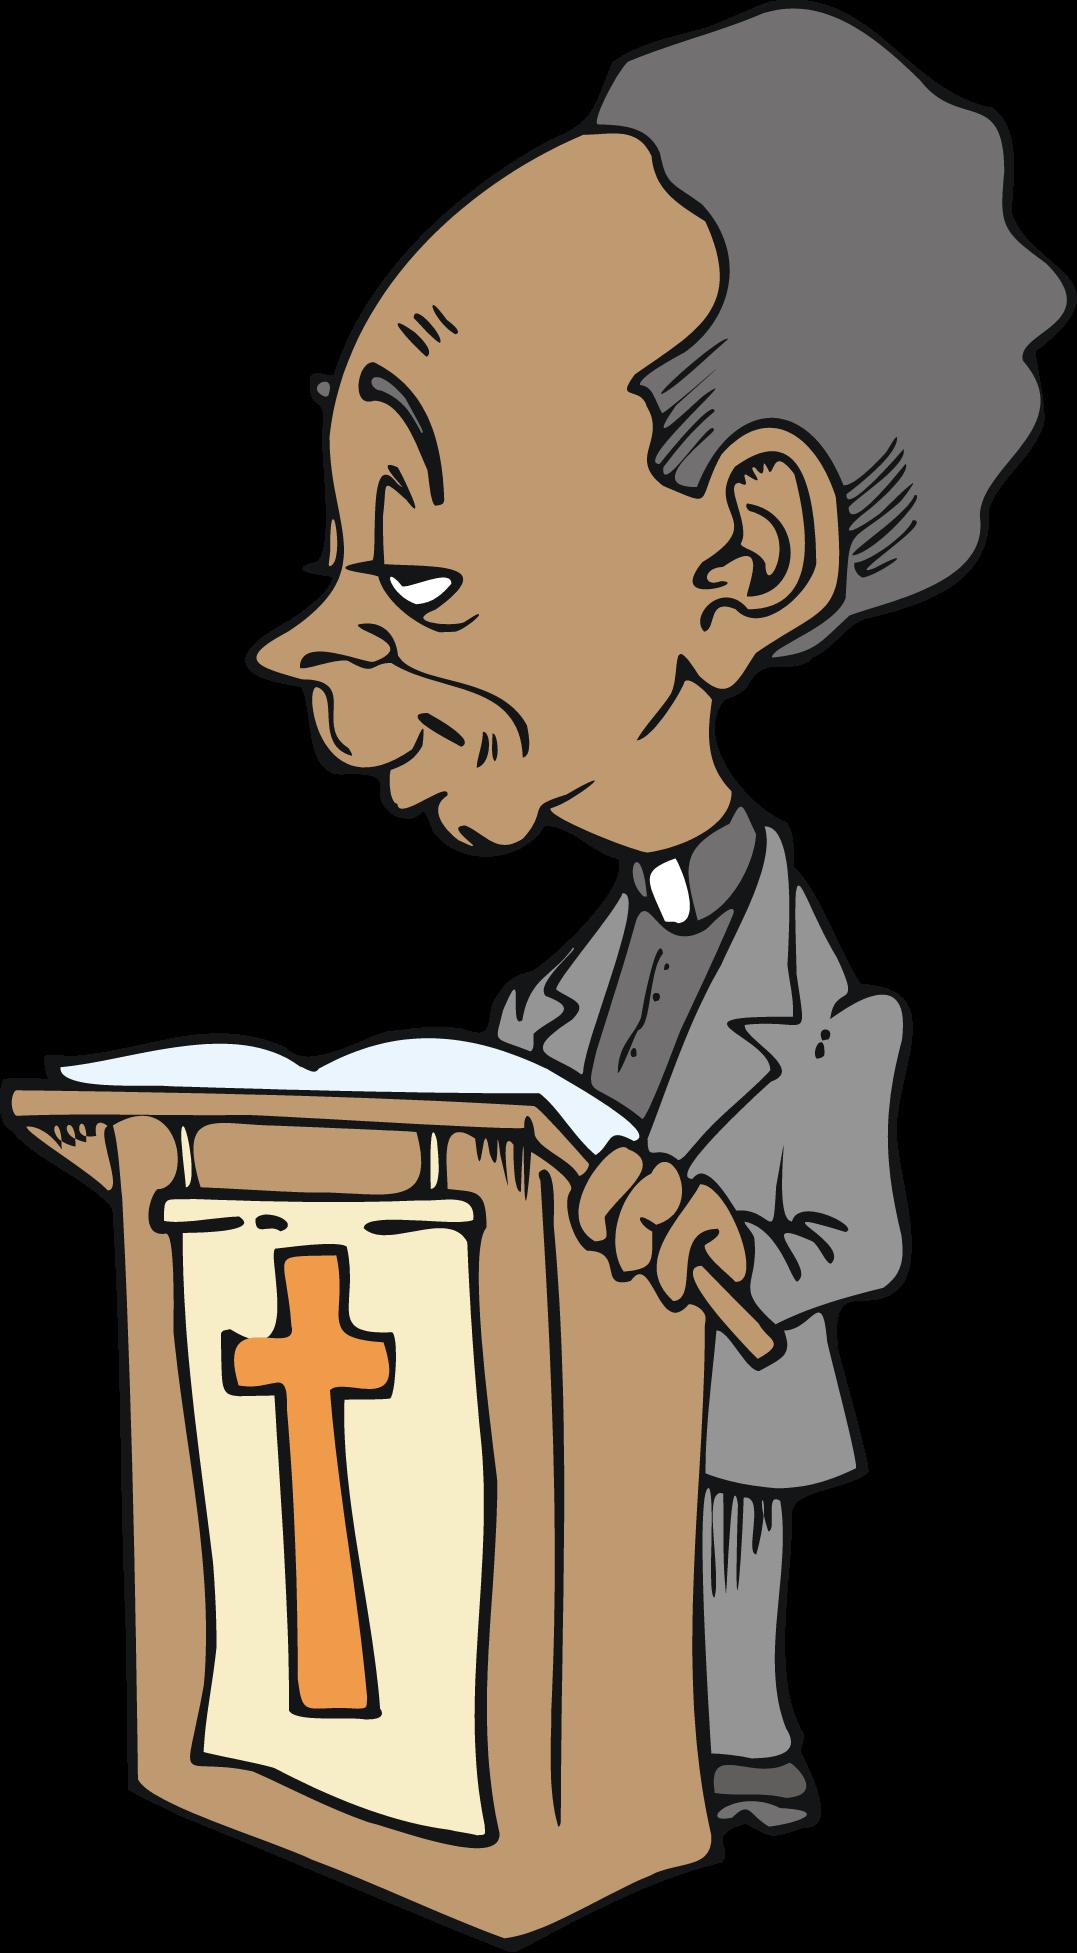 Clipart wedding african american. Free cartoon character preacher